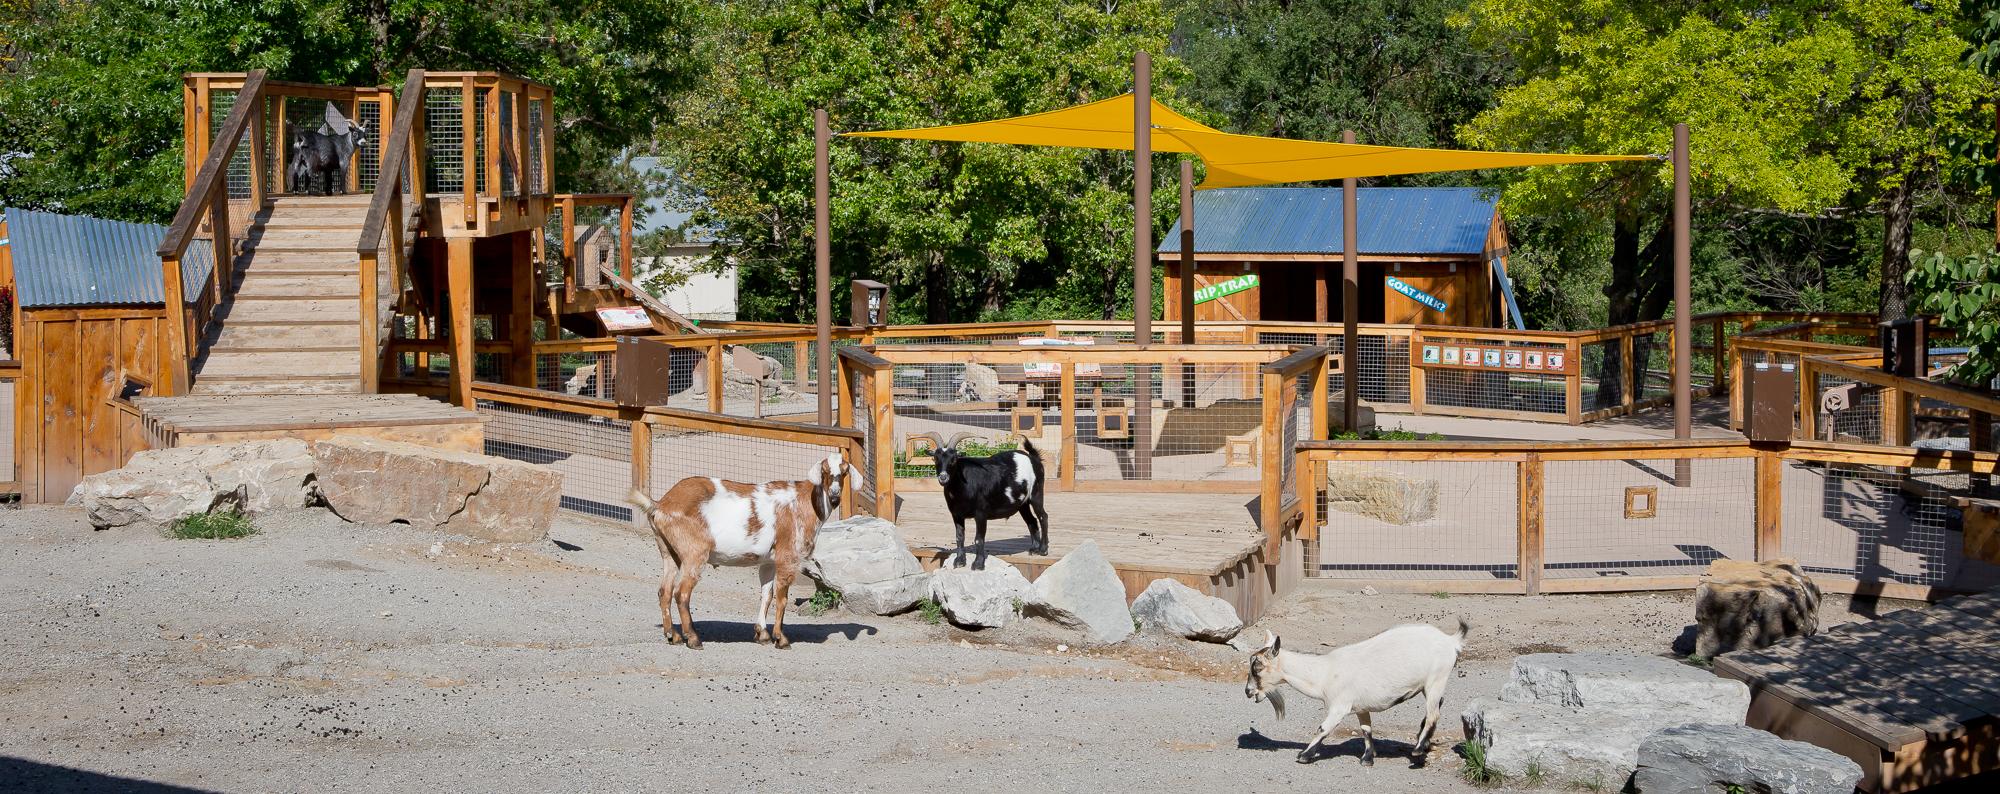 KC Goat Exhibit